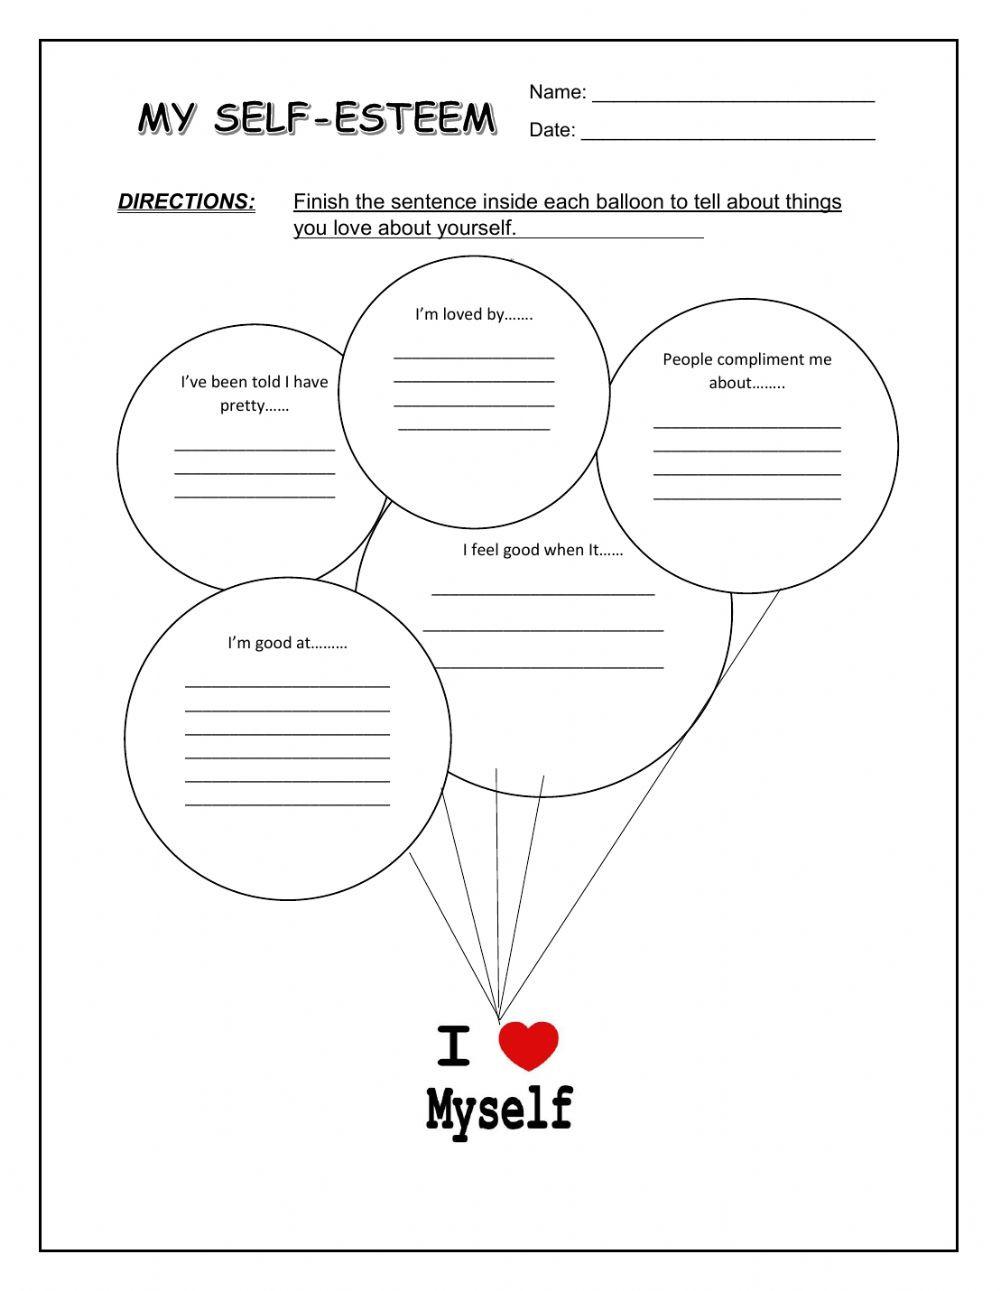 Self Esteem Worksheet for Adults My Self Esteem Interactive Worksheet